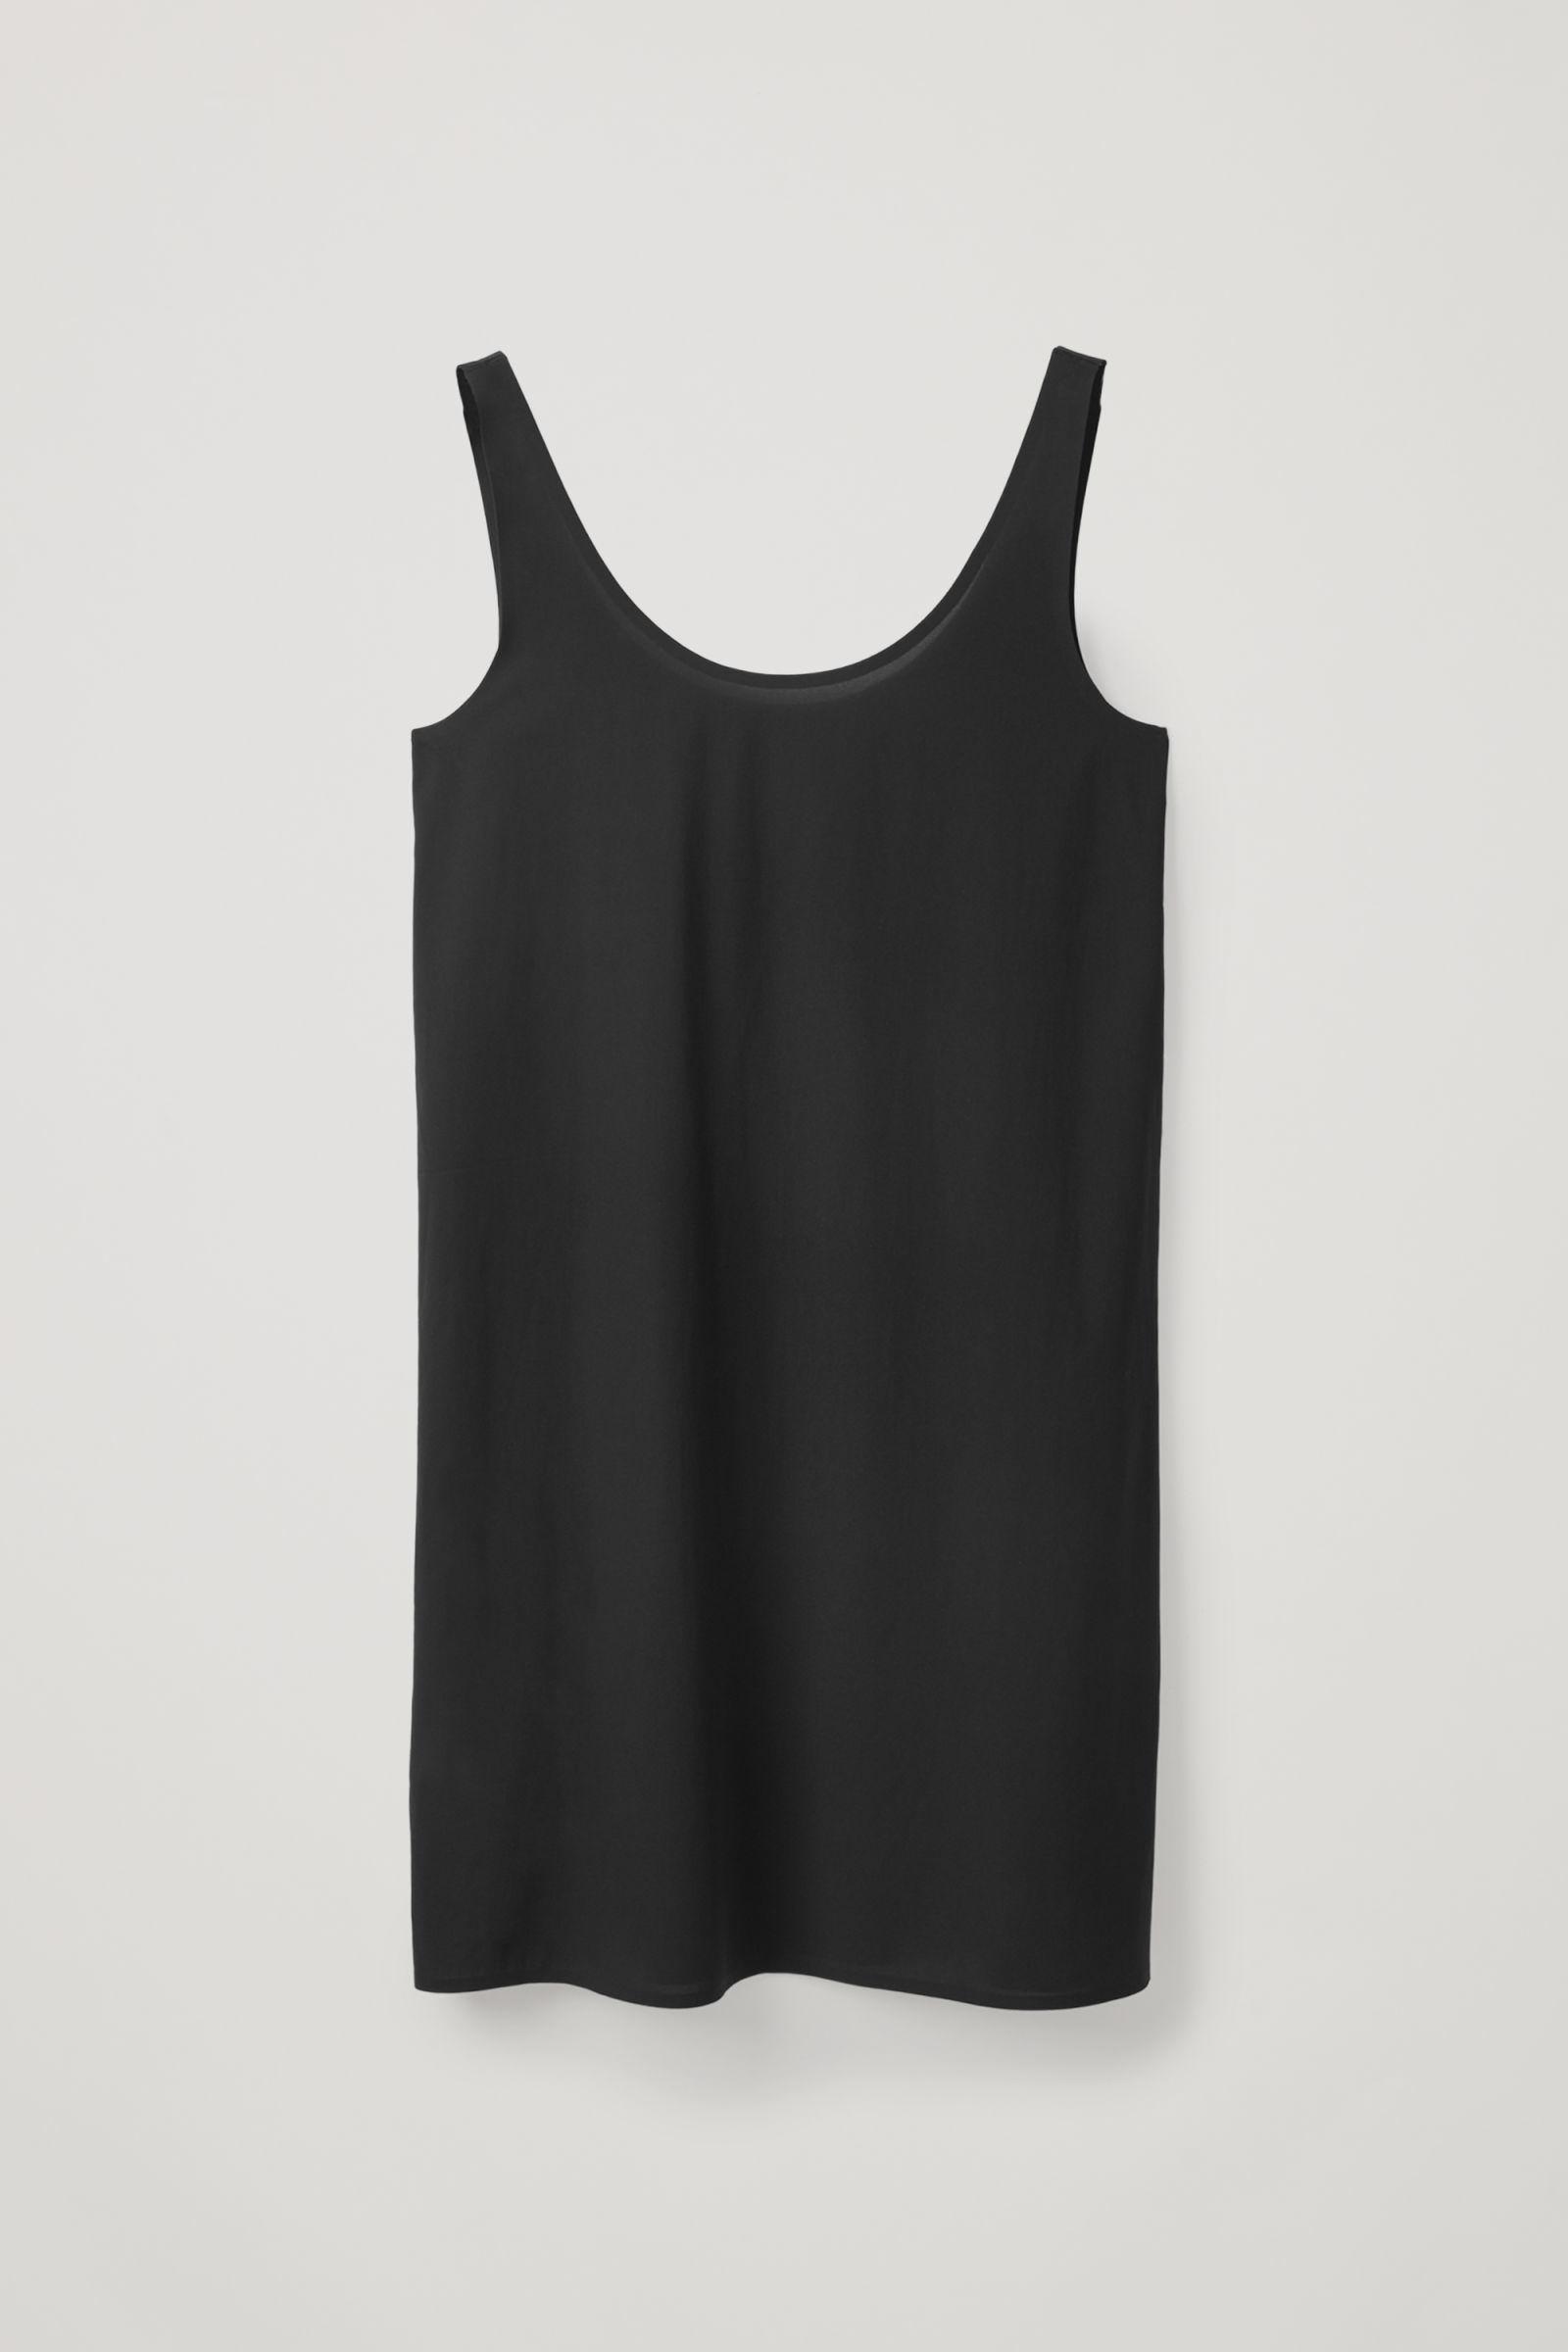 COS 심리스 슬립 드레스 의 블랙컬러 Product입니다.